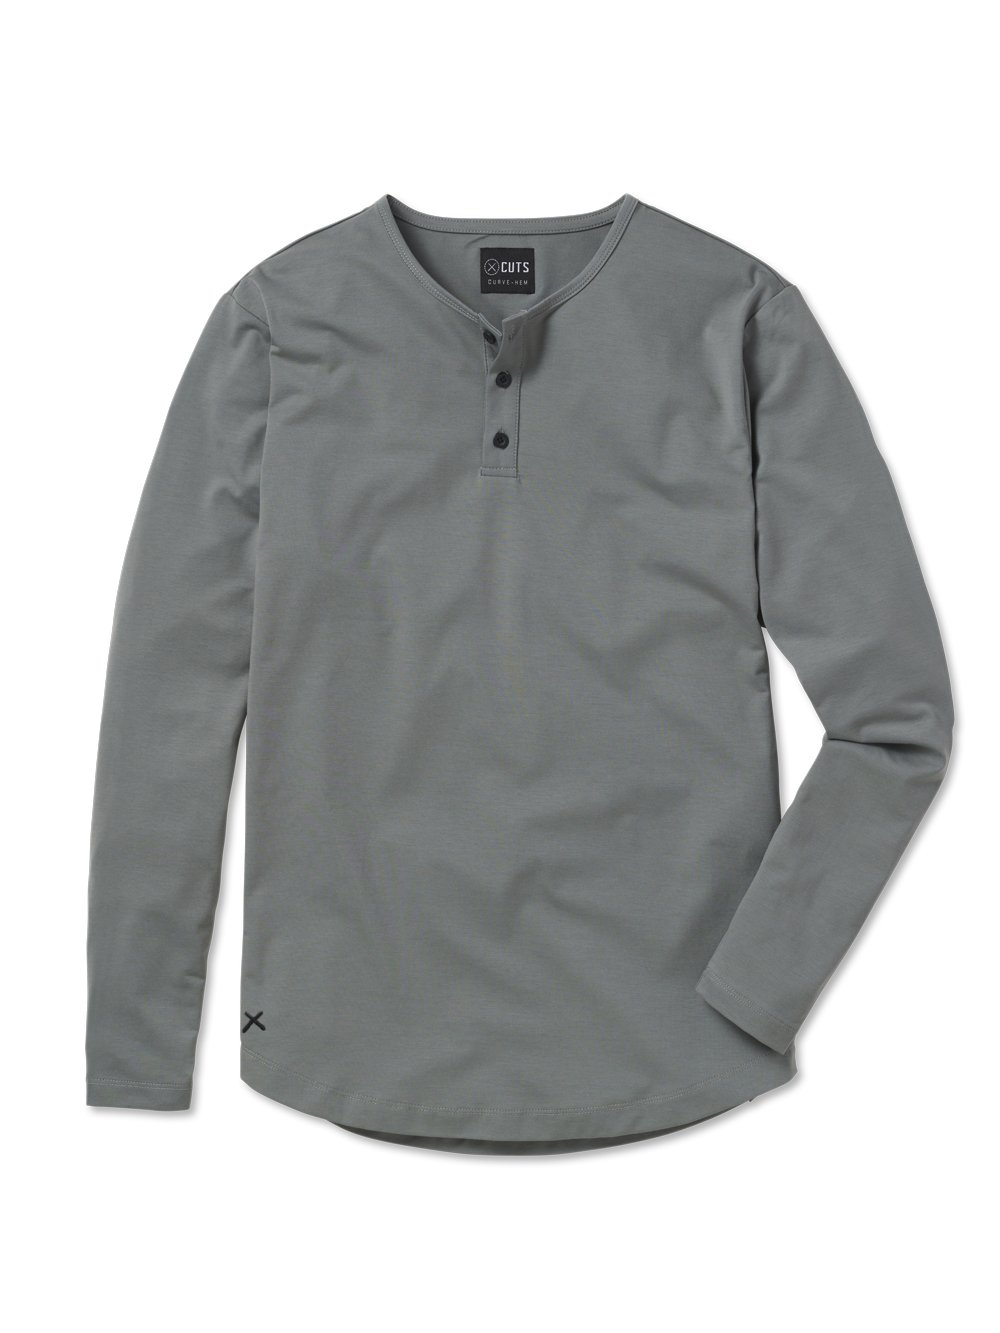 cuts clothing long-sleeve henley t-shirts